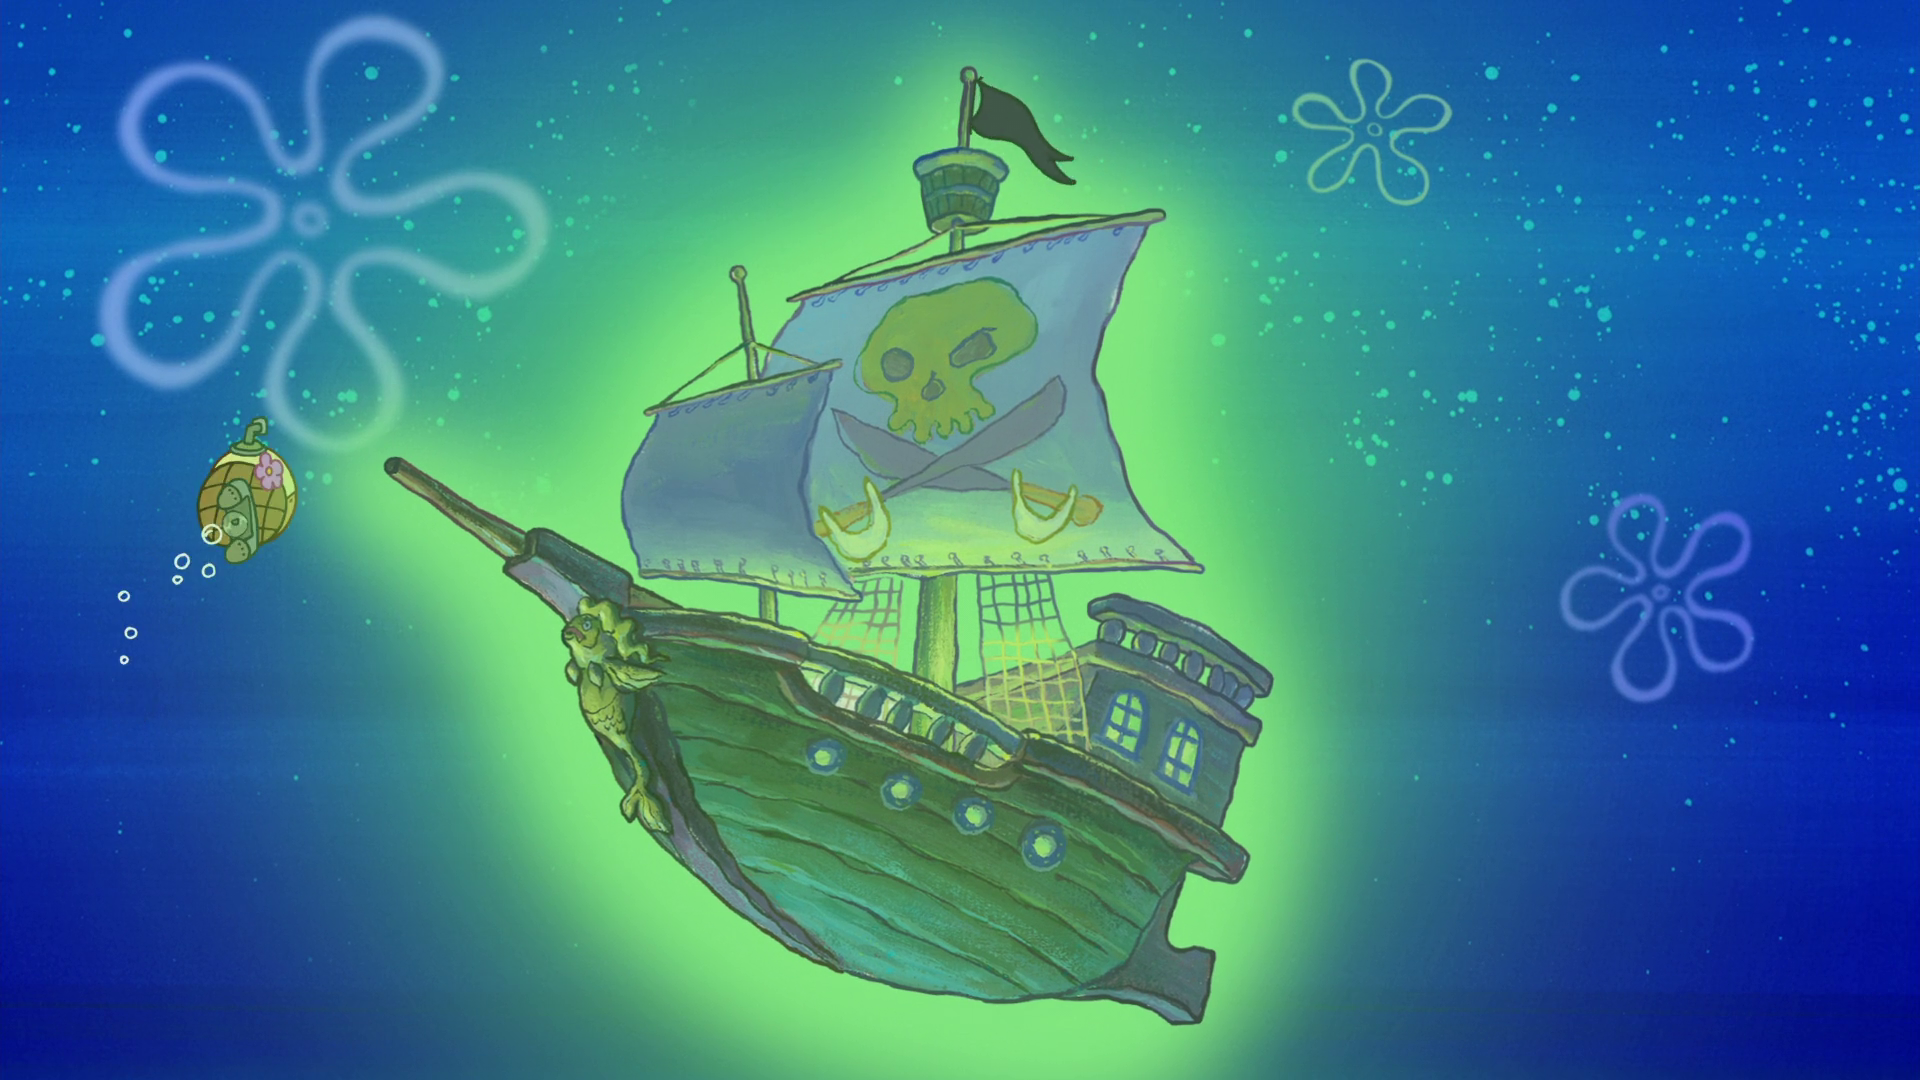 Flying Dutchman's ship